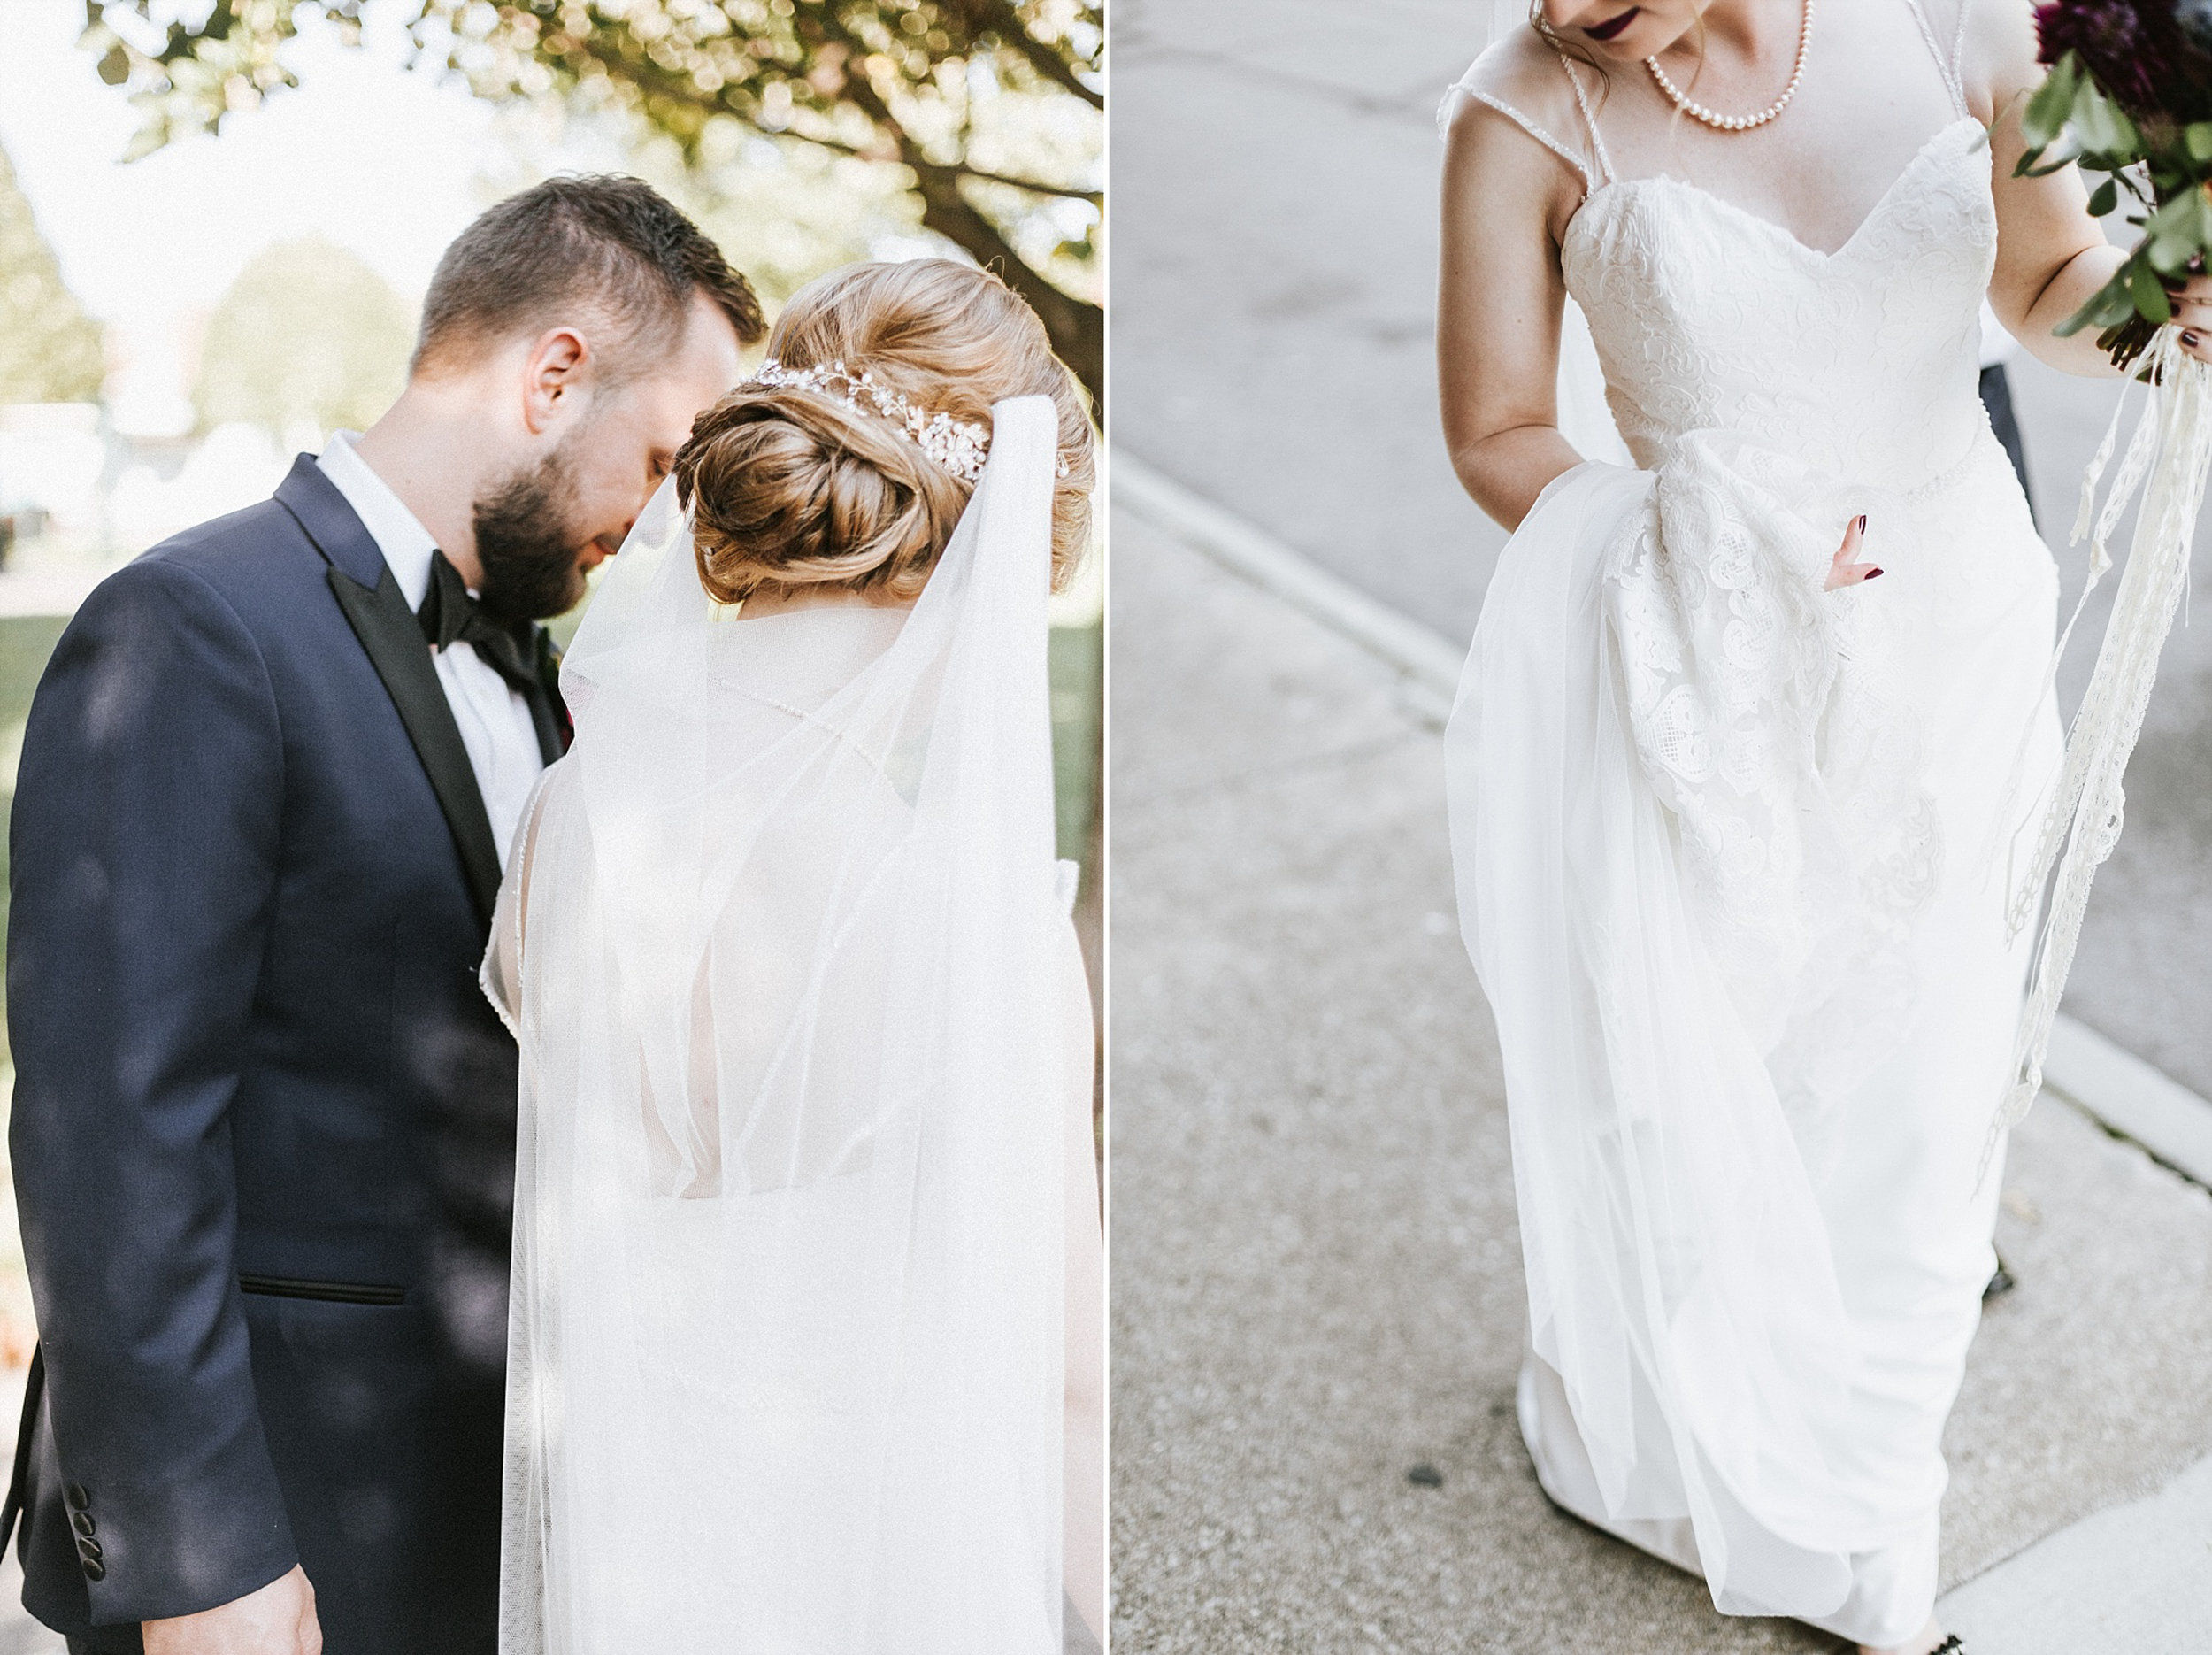 Brooke Townsend Photography - Ohio Wedding Photographer-153.jpg